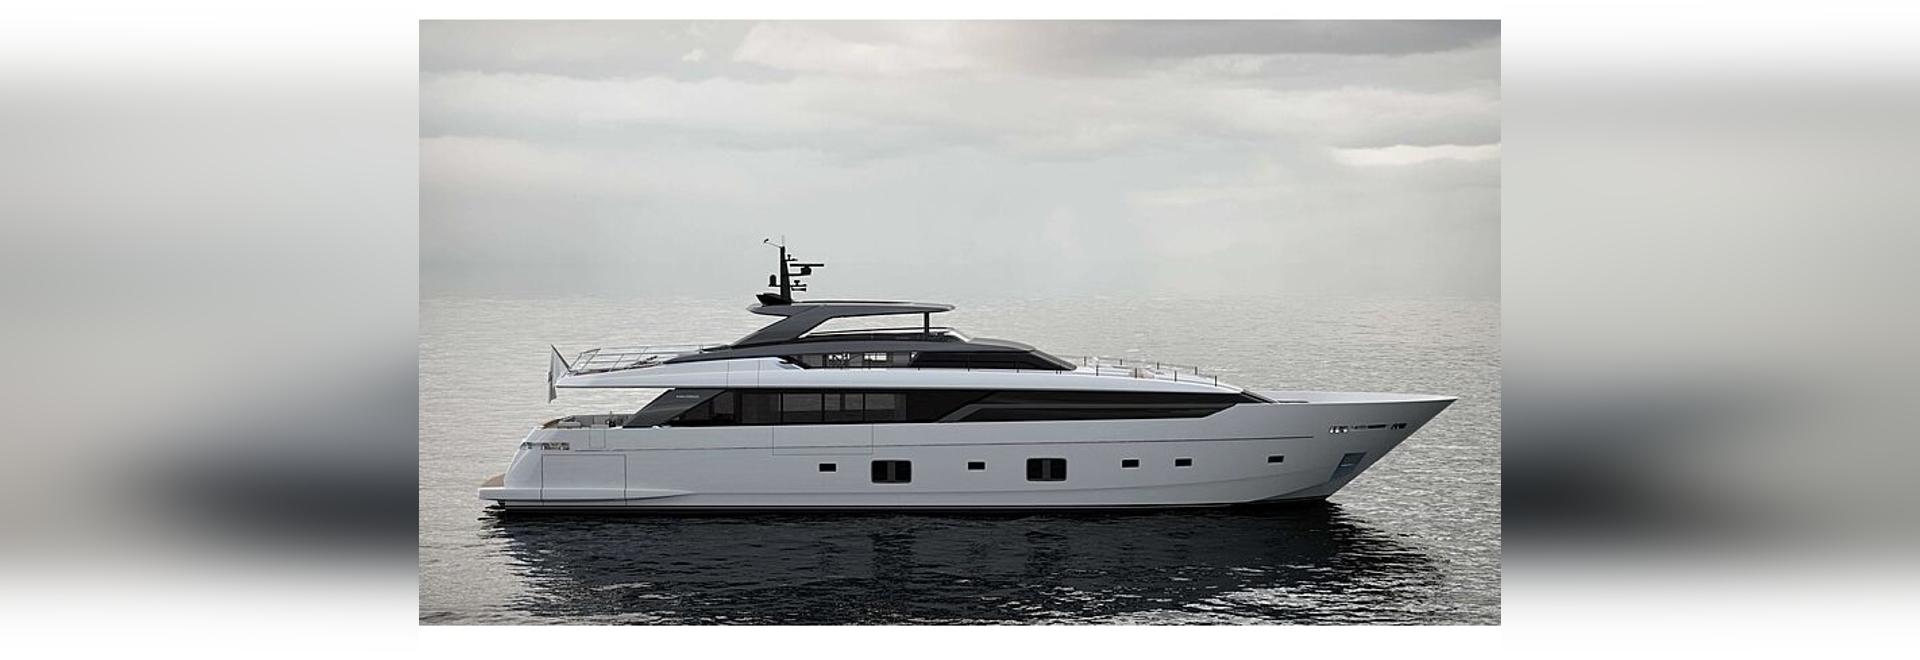 New flagship for Sanlorenzo: the SL120Asymmetric